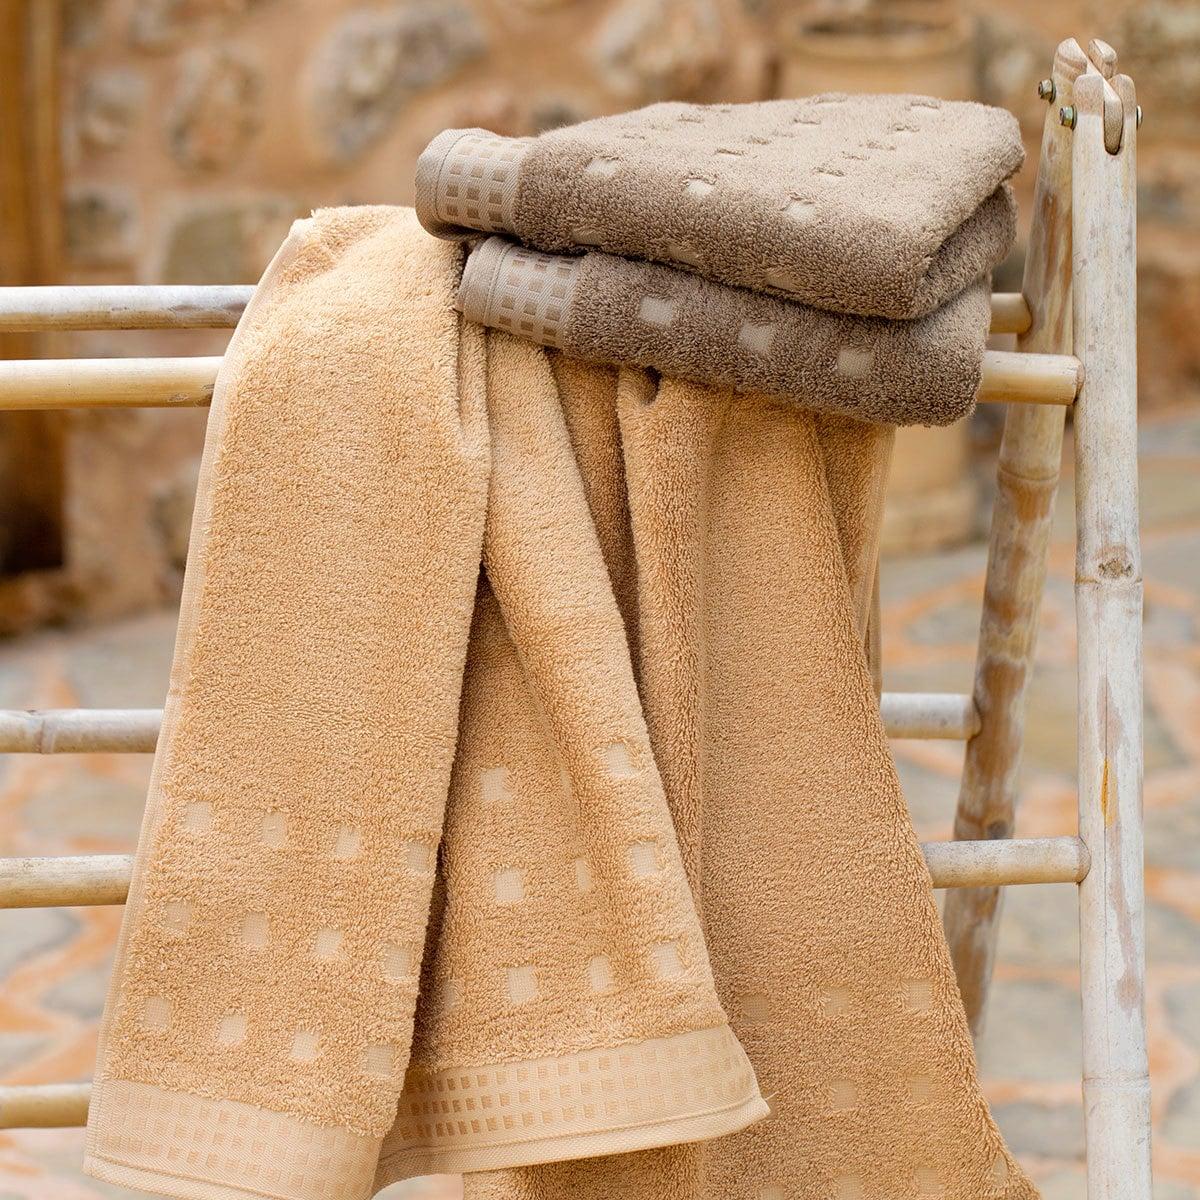 vossen handt cher country style tibet g nstig online. Black Bedroom Furniture Sets. Home Design Ideas